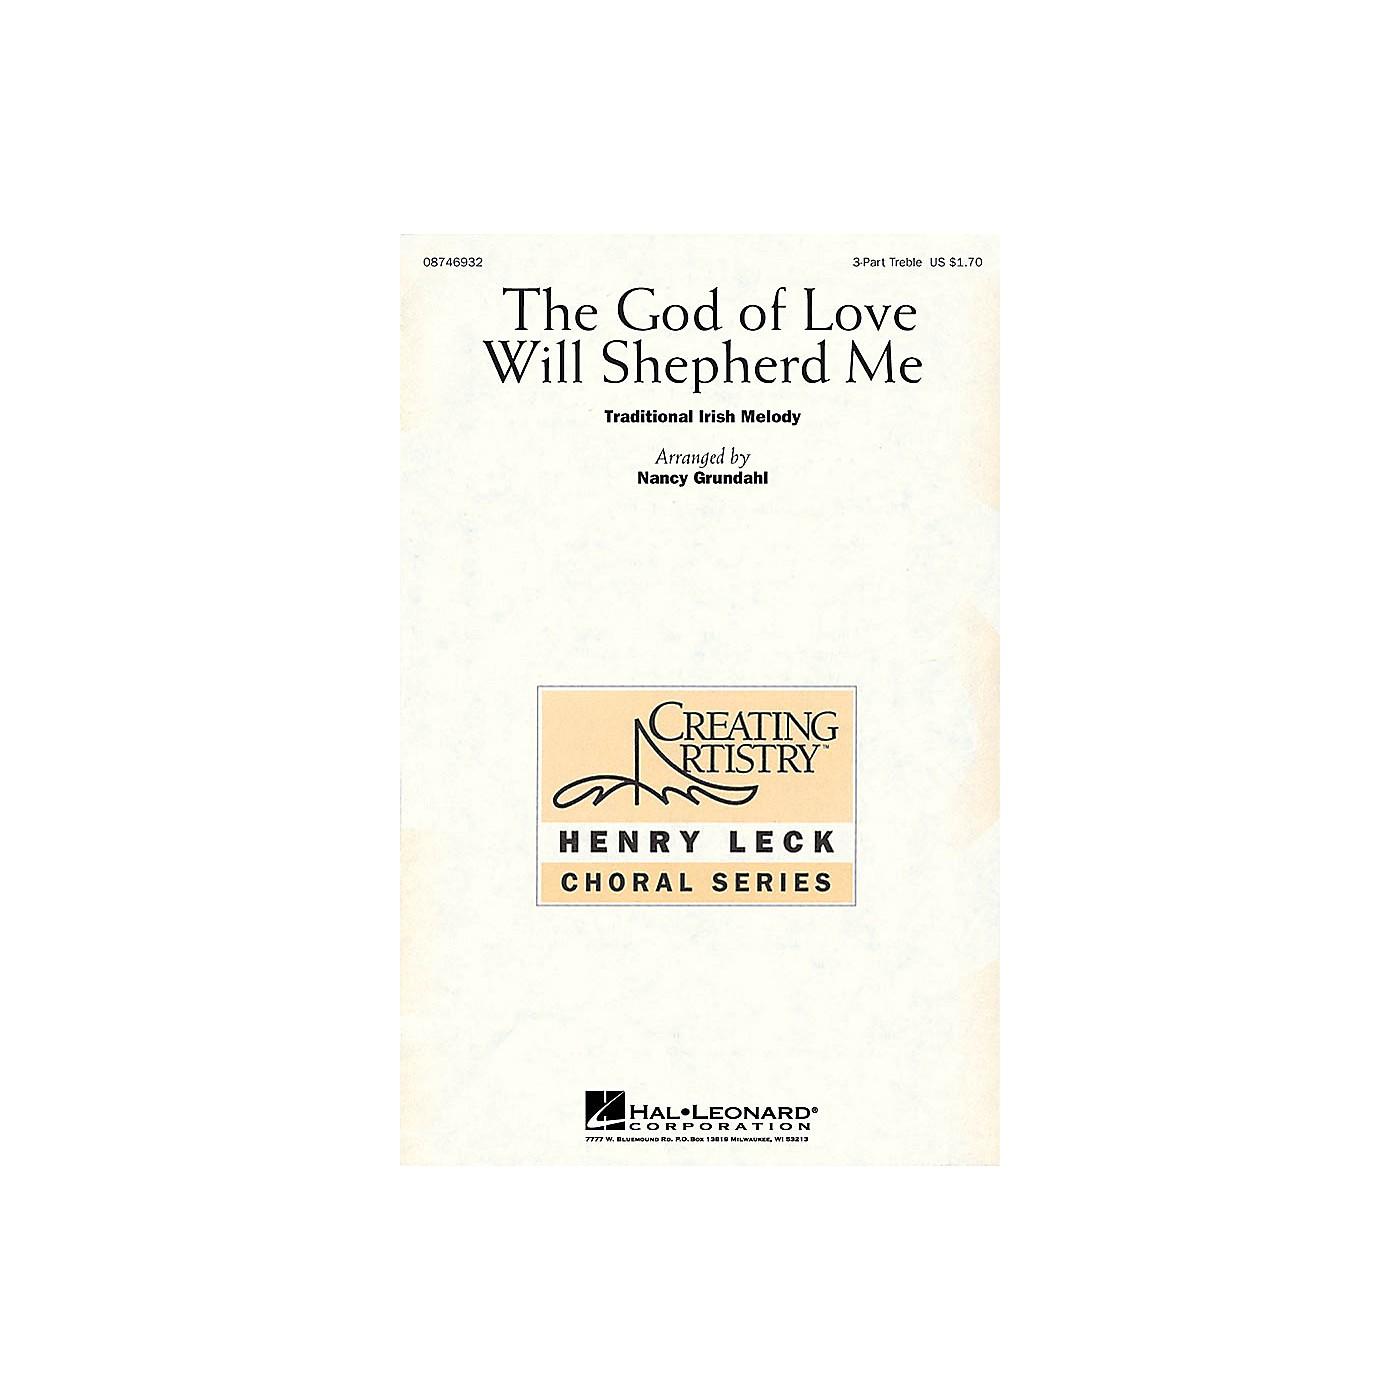 Hal Leonard The God of Love Will Shepherd Me 3 Part Treble arranged by Nancy Grundahl thumbnail